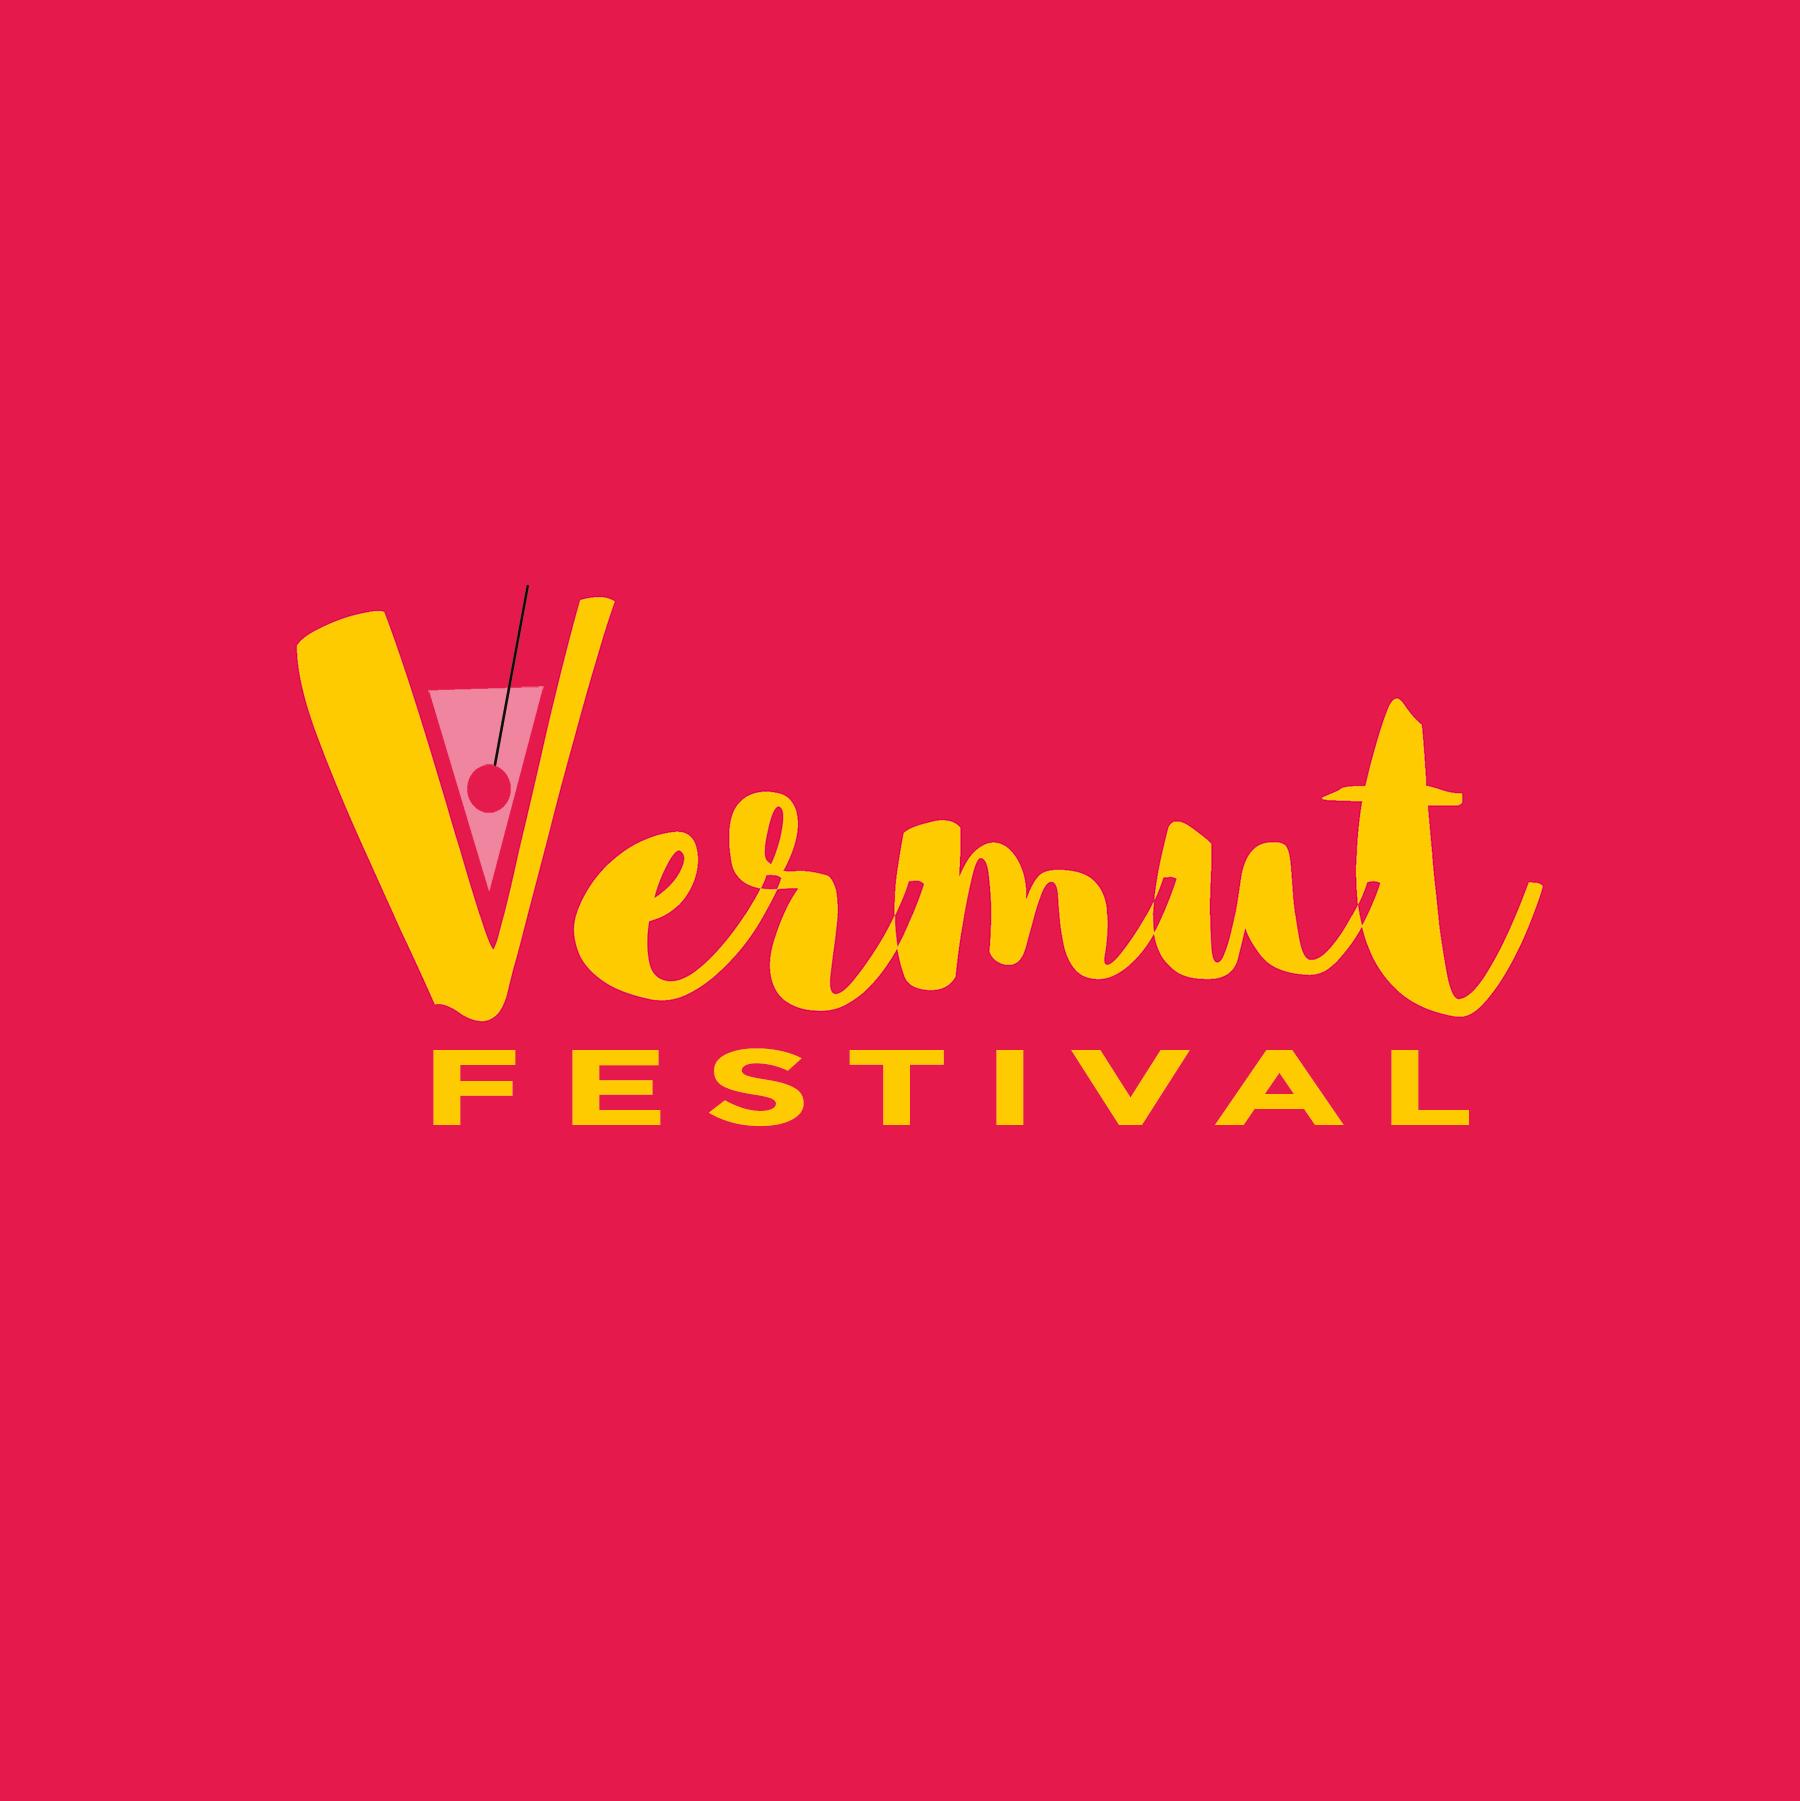 Vermut-FESTIVAL-GENERICO